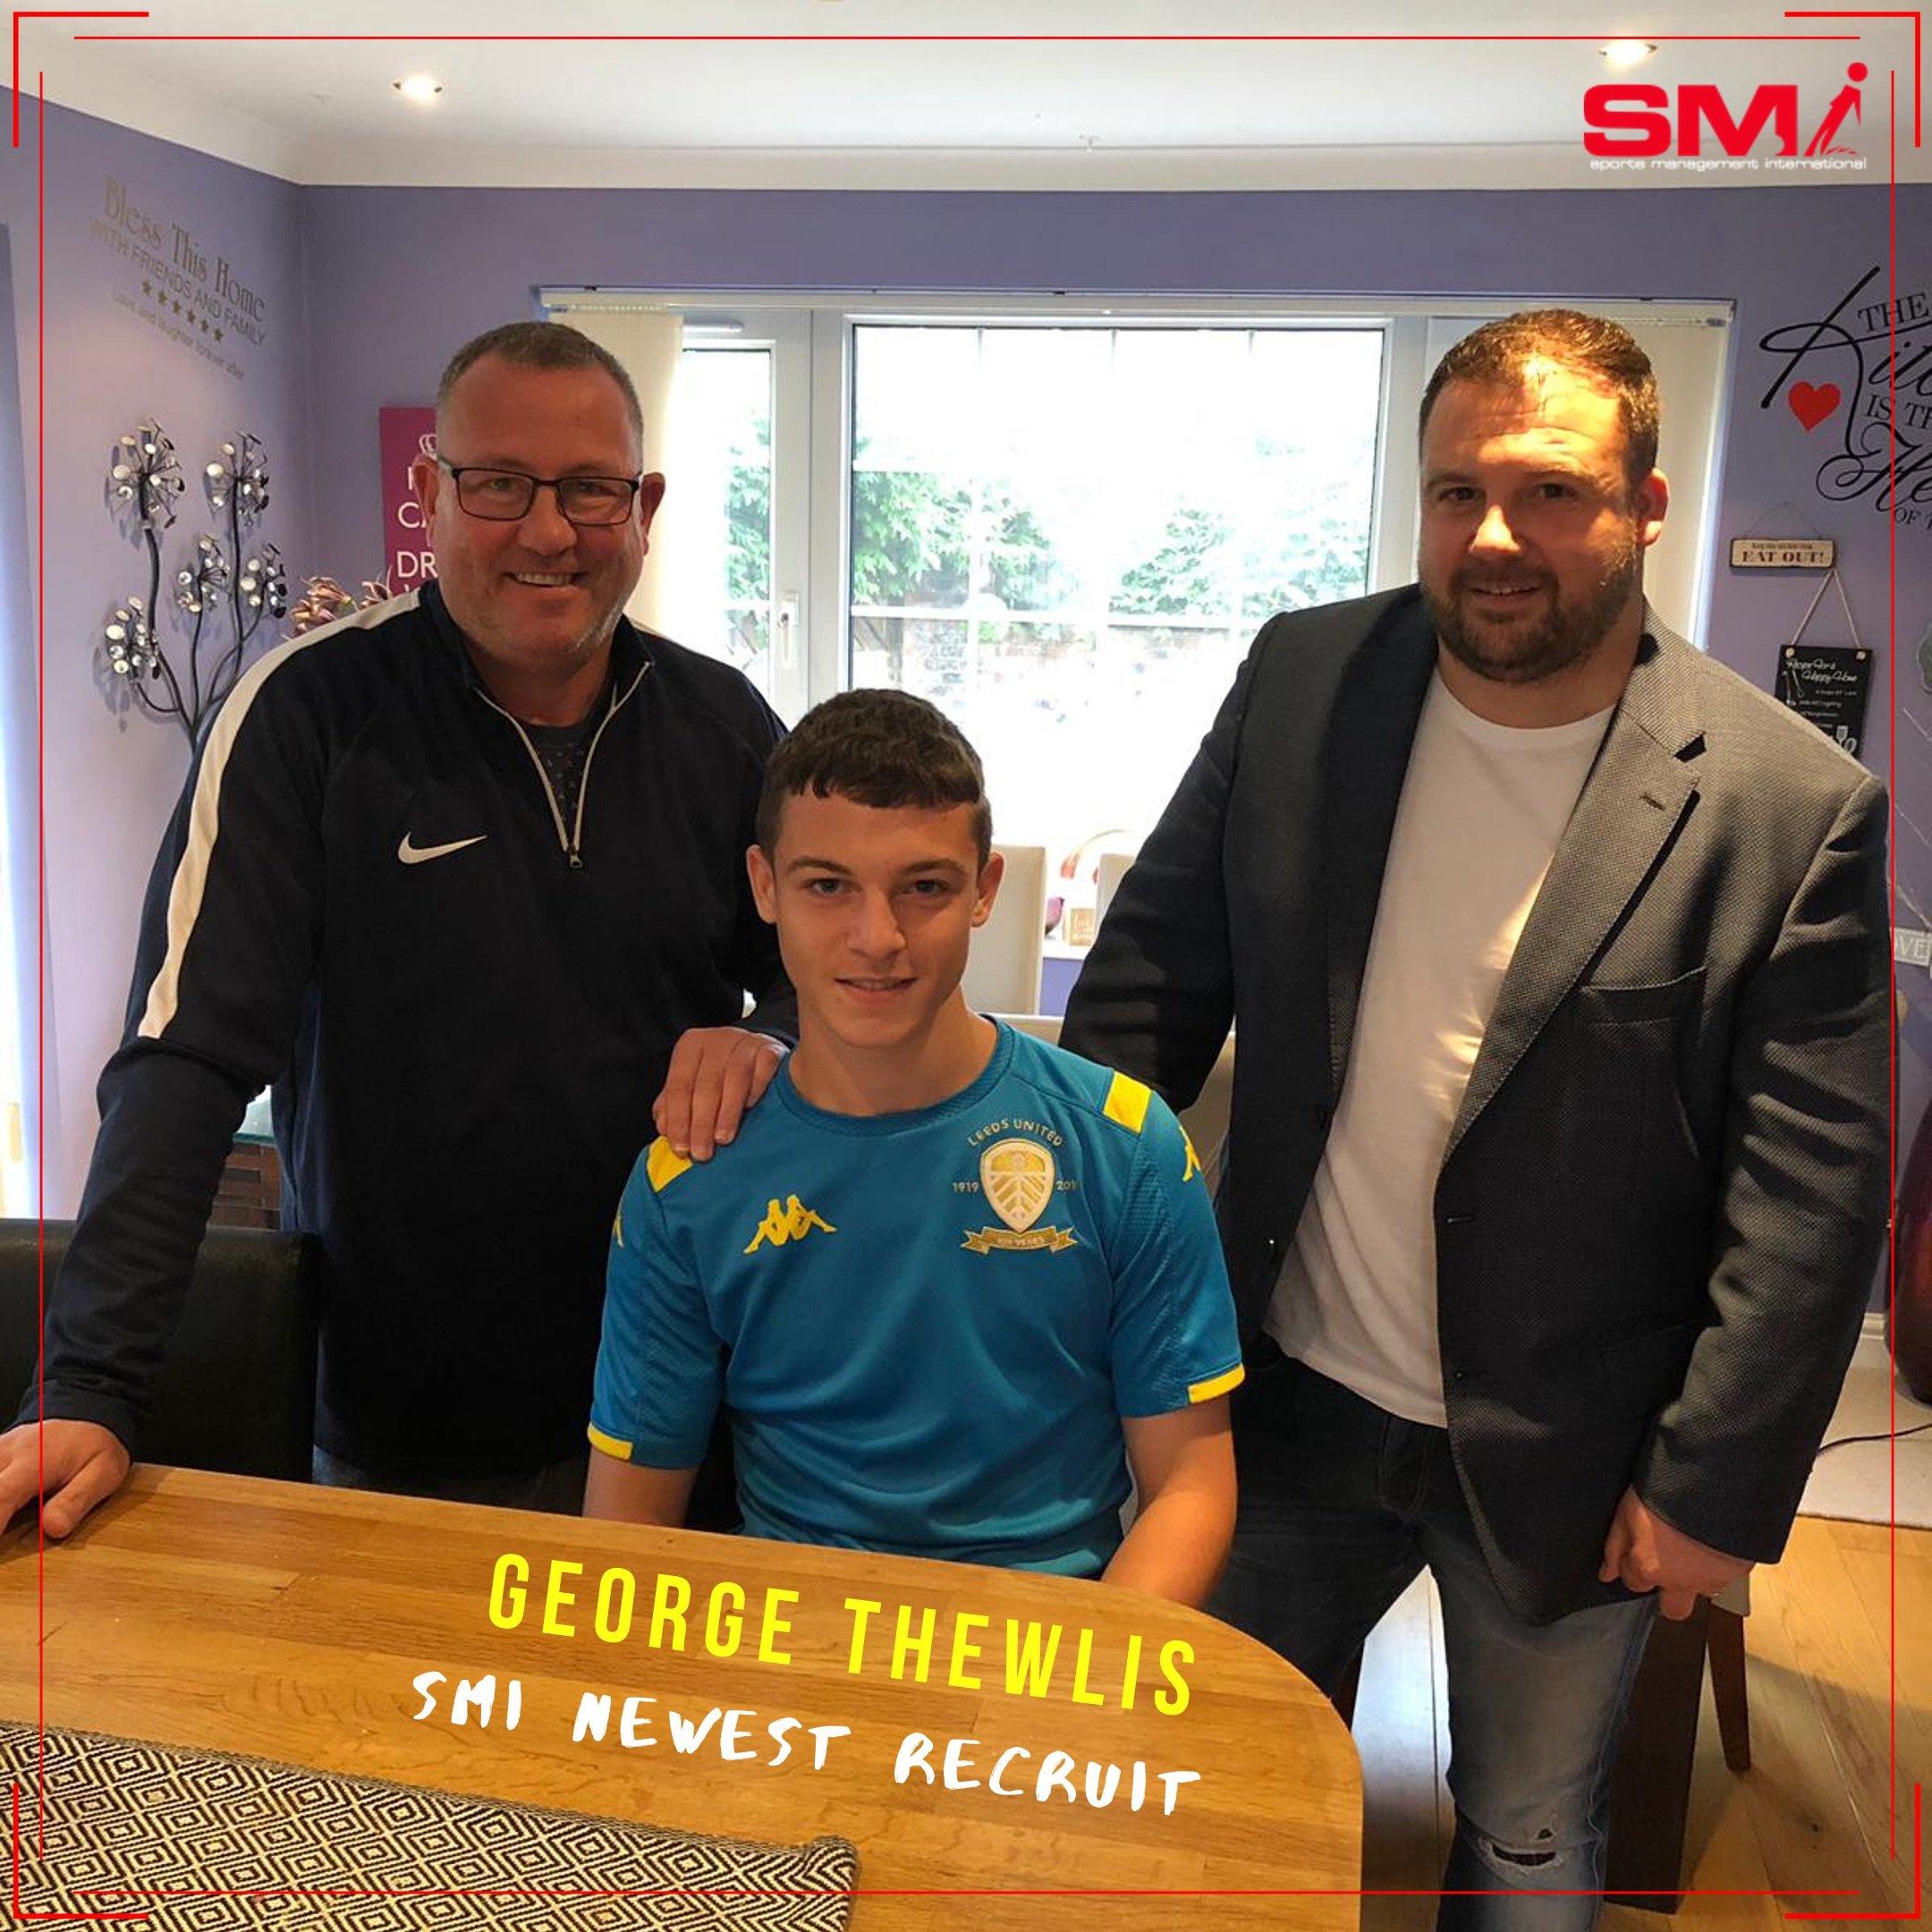 SMI Newest Recruit George Thewlis